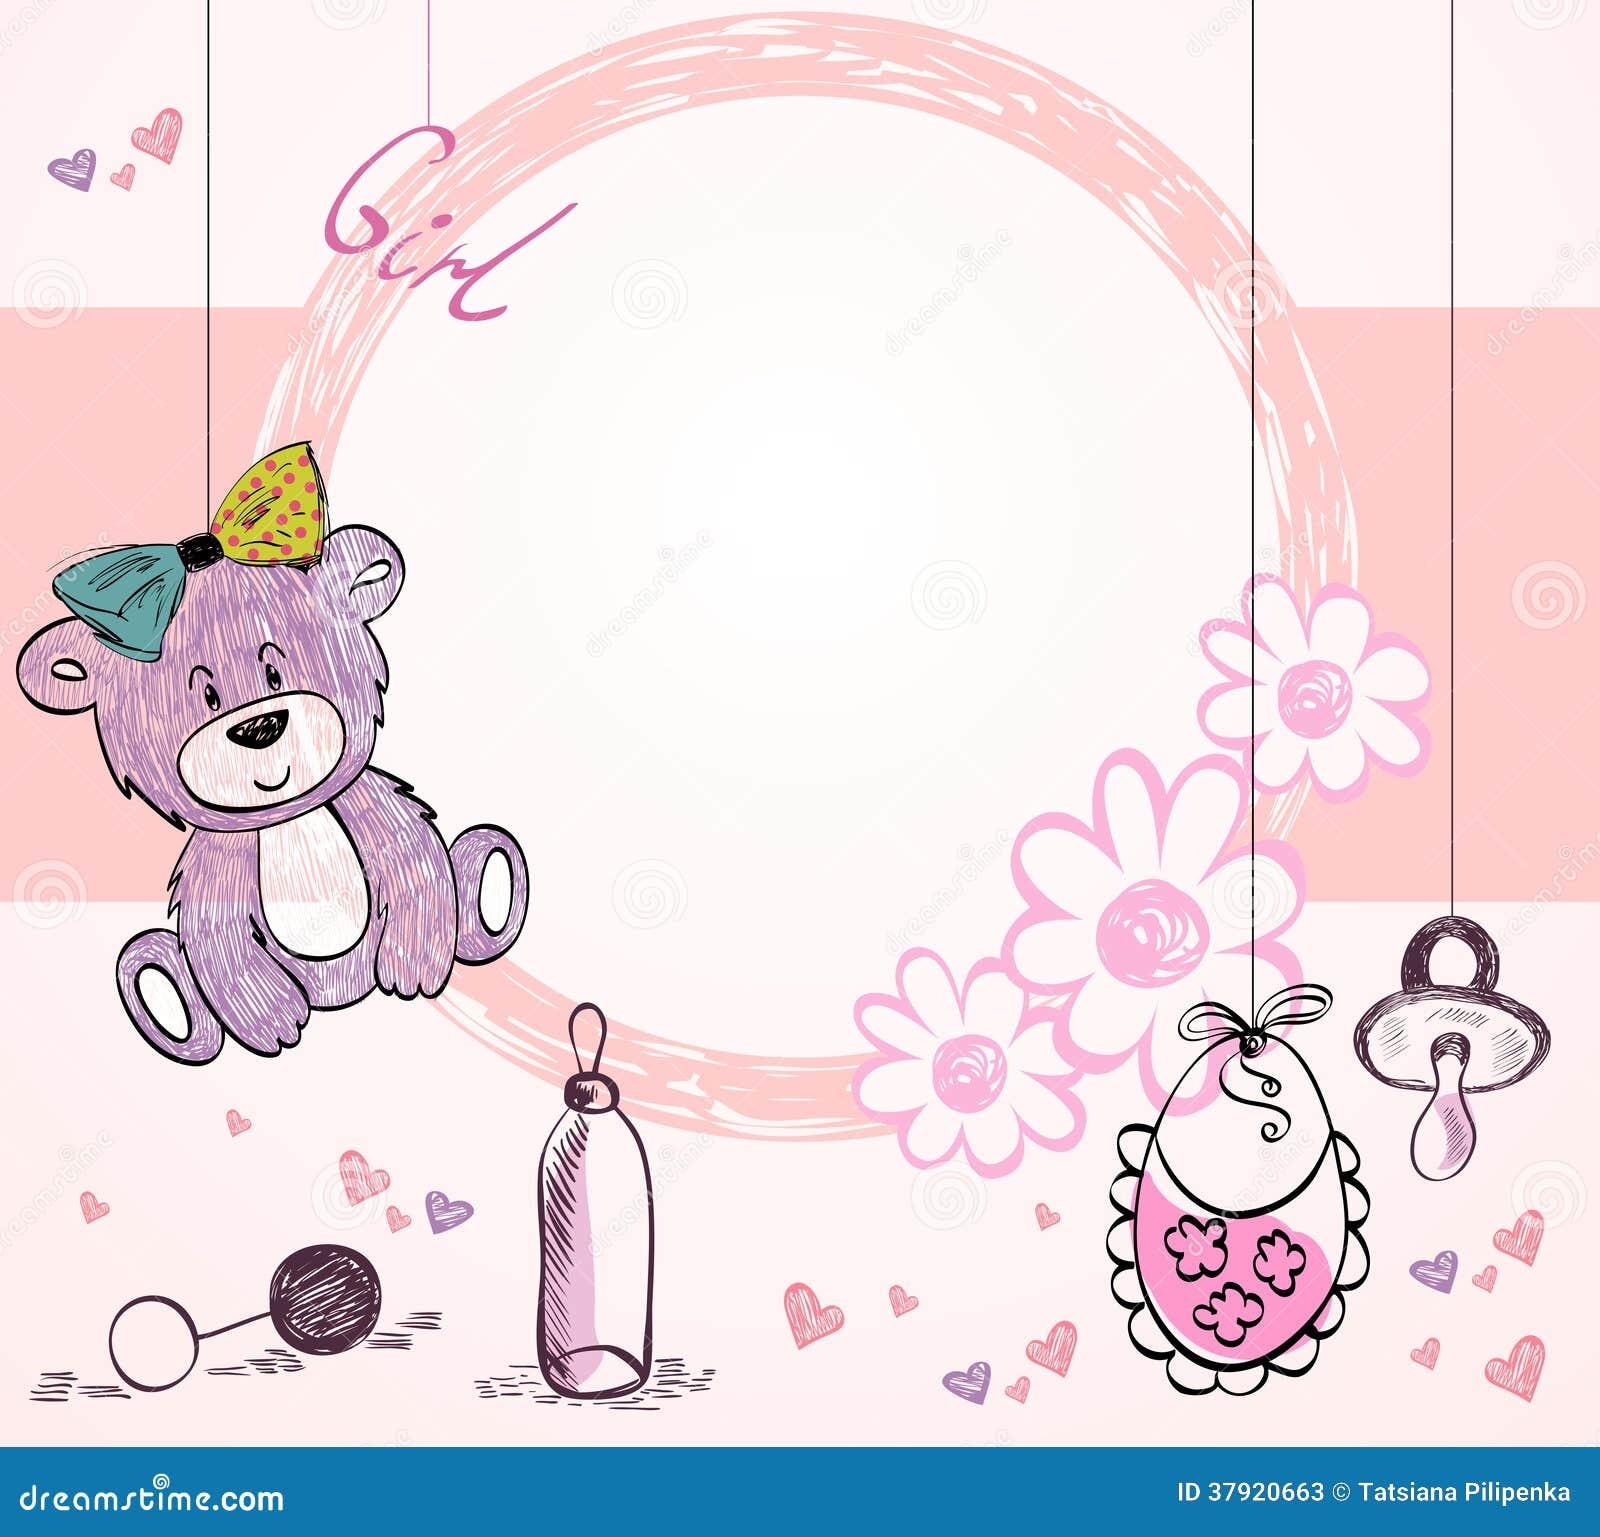 Baby-Rahmen vektor abbildung. Illustration von gruß, kind - 37920663